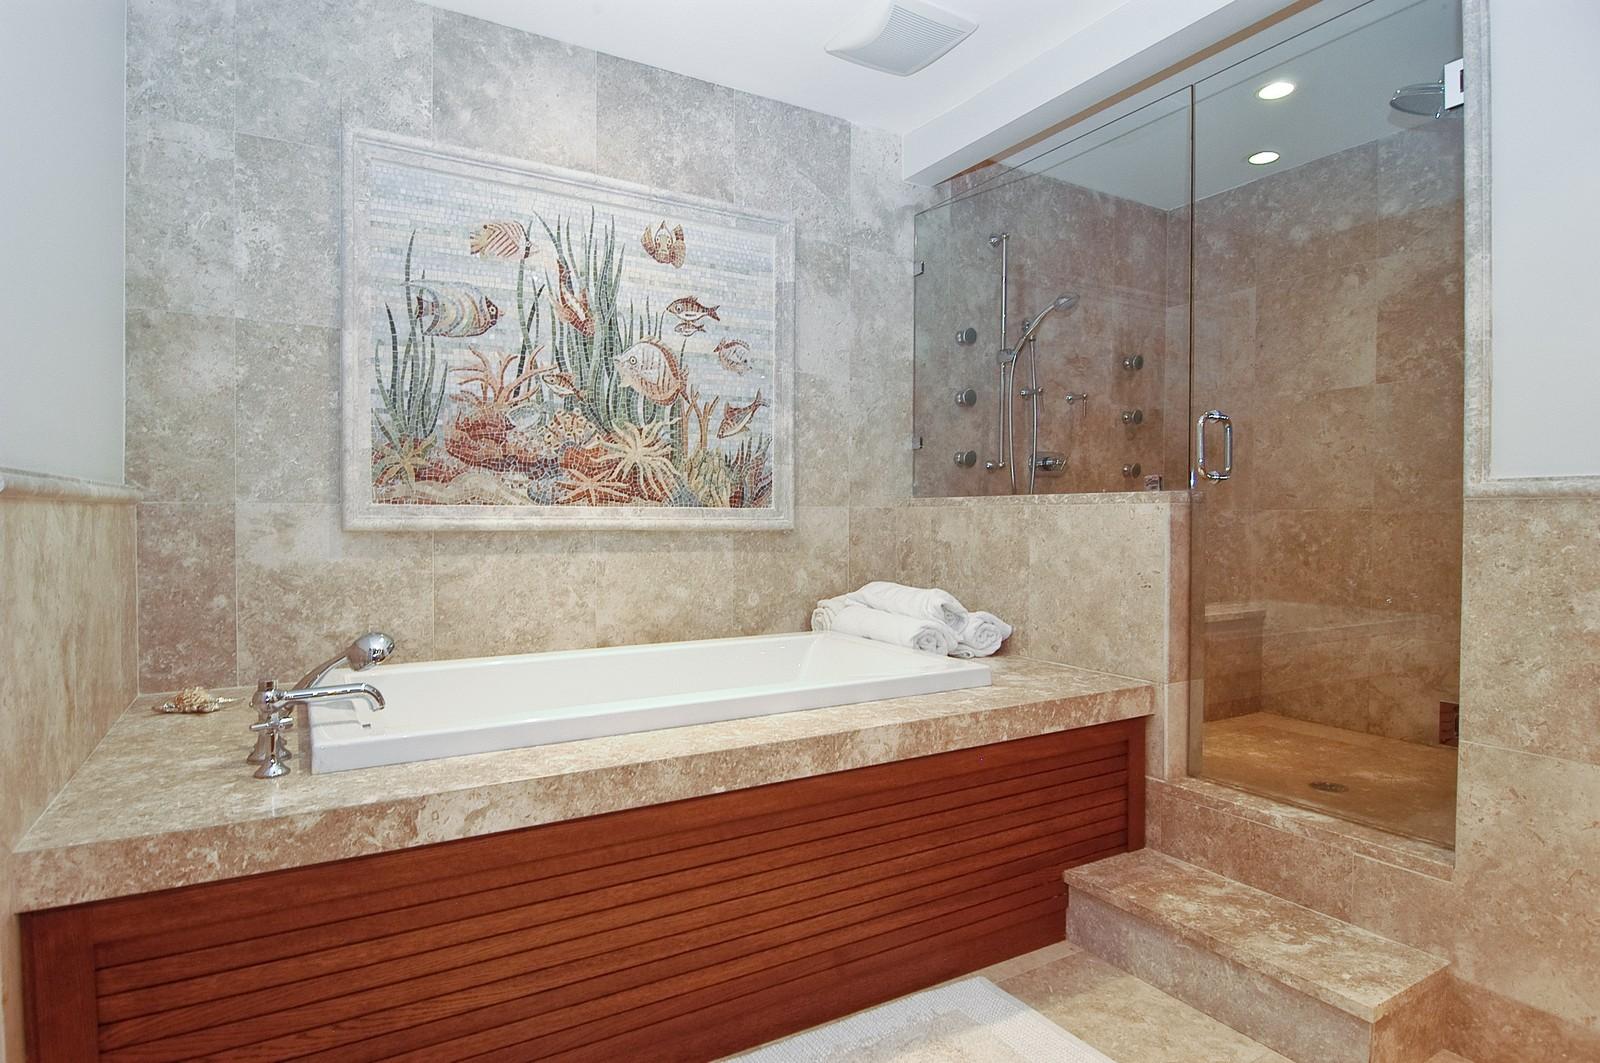 Real Estate Photography - 2331 Fish Island Dr, Fisher Island, FL, 33109 - Master Bathroom